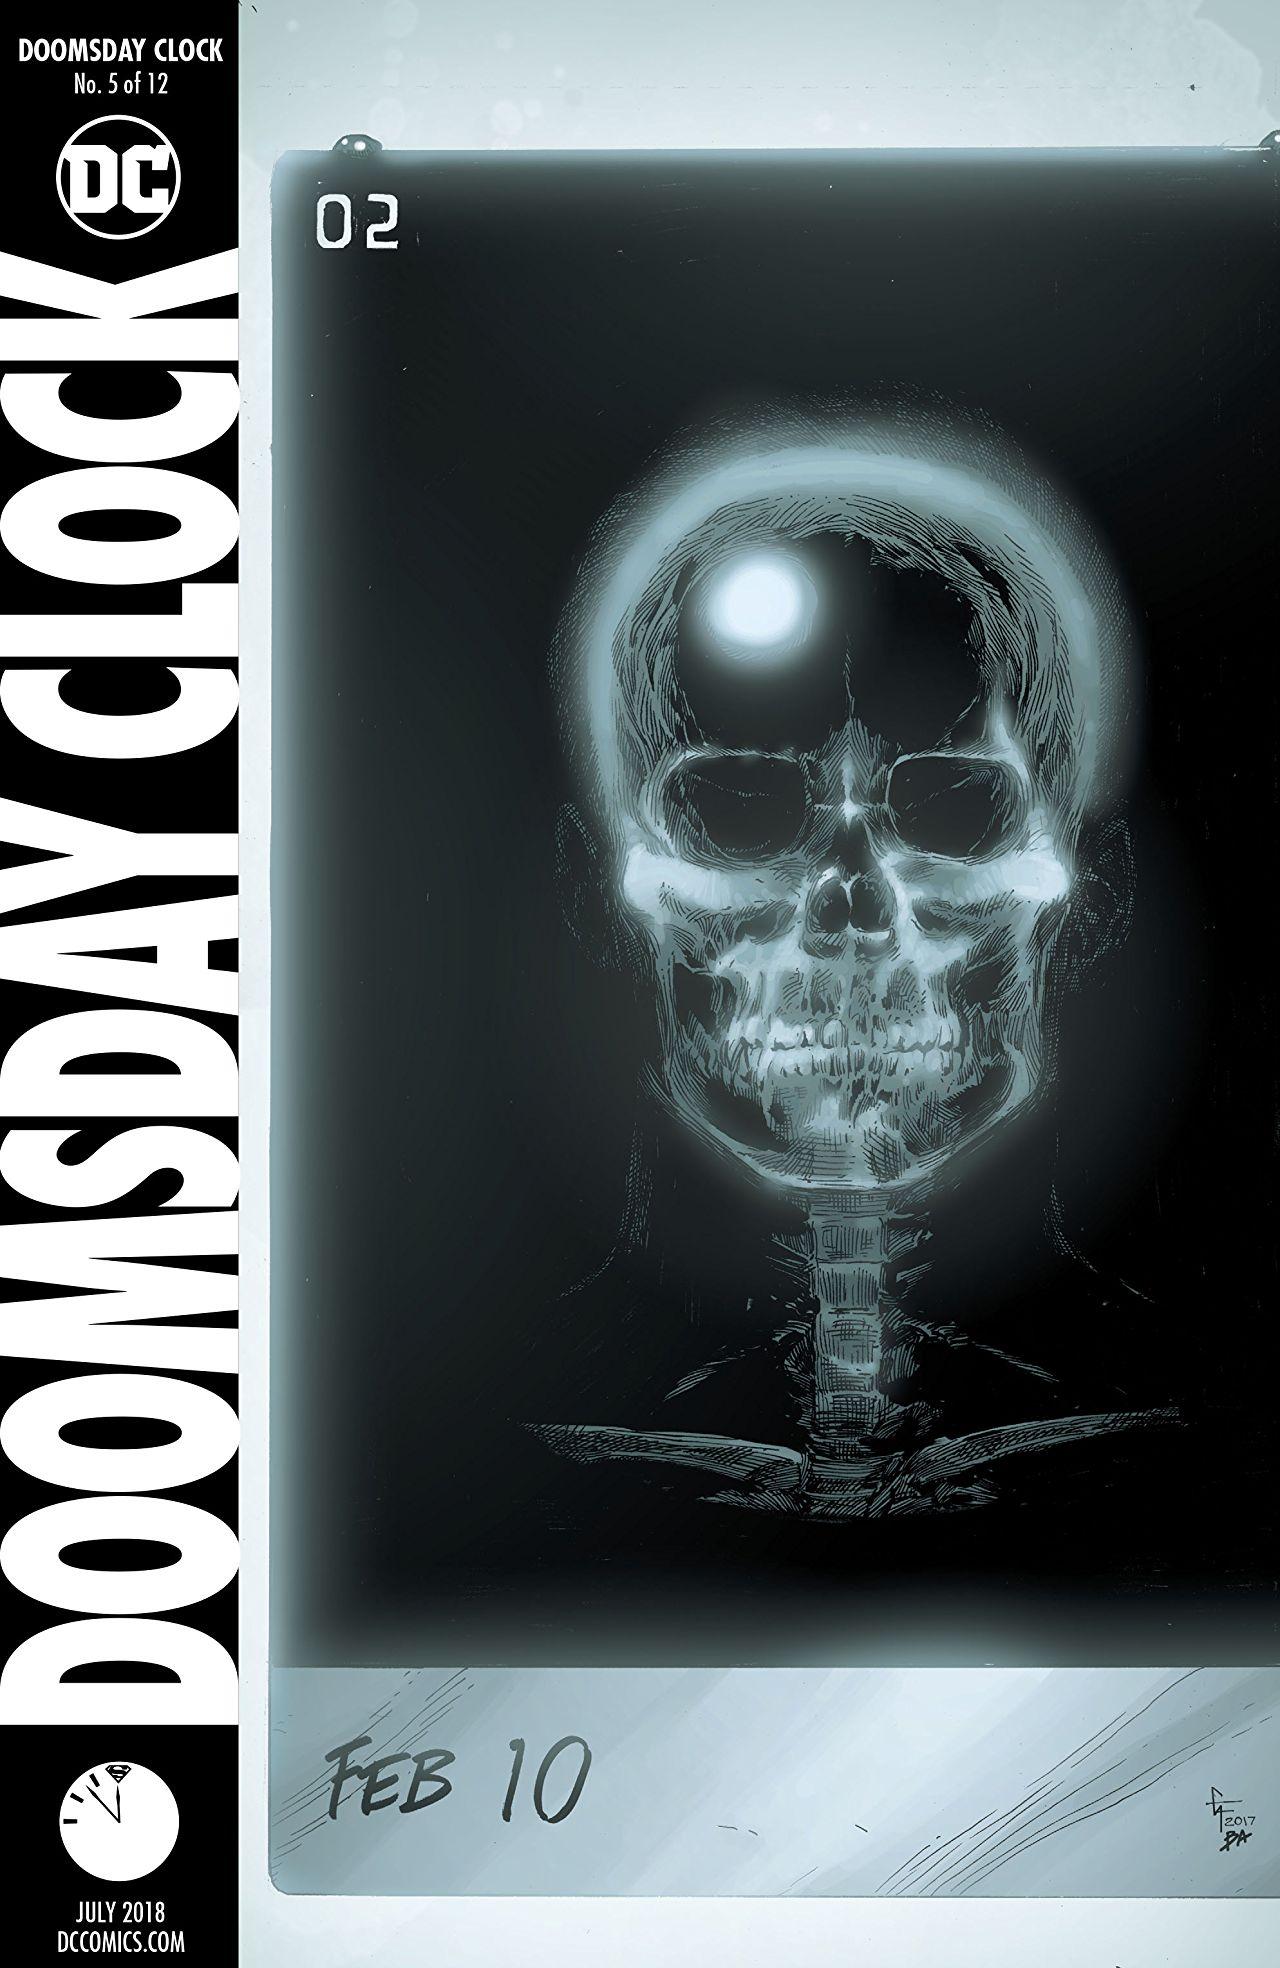 doomsday clock live june 2020